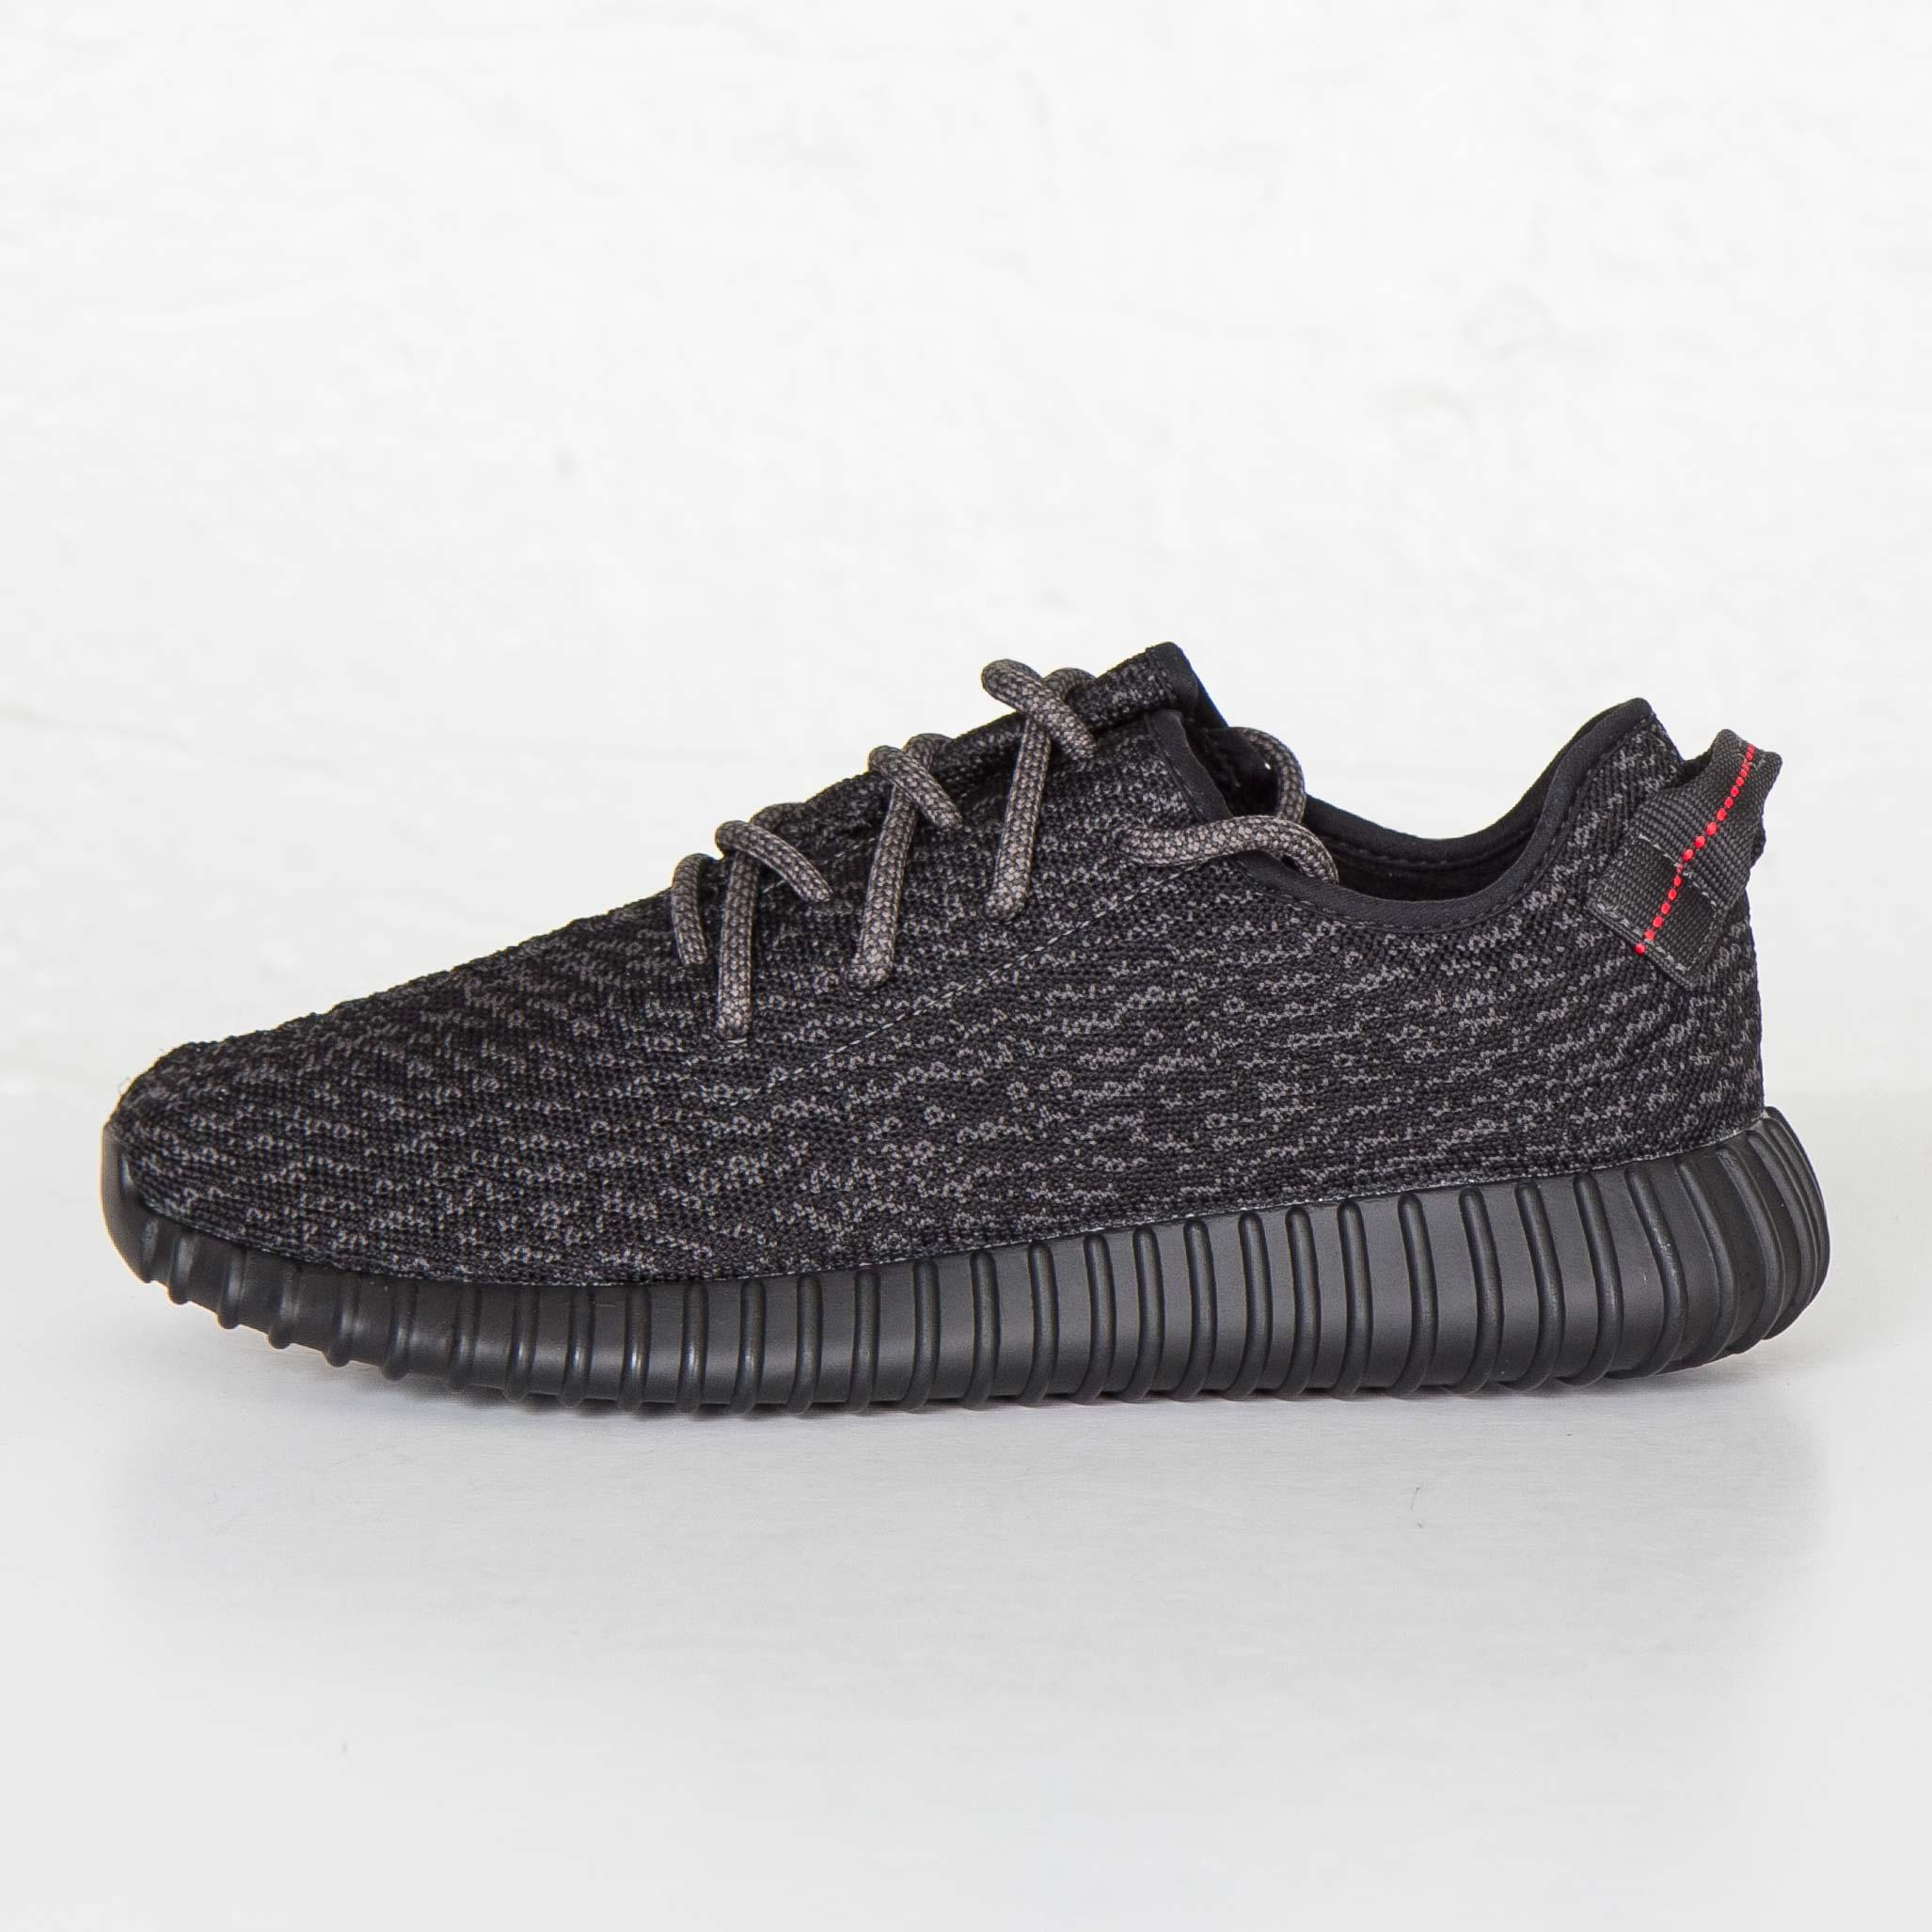 Kanye West Adidas Yeezy Boost 350 V1 Pirate Black